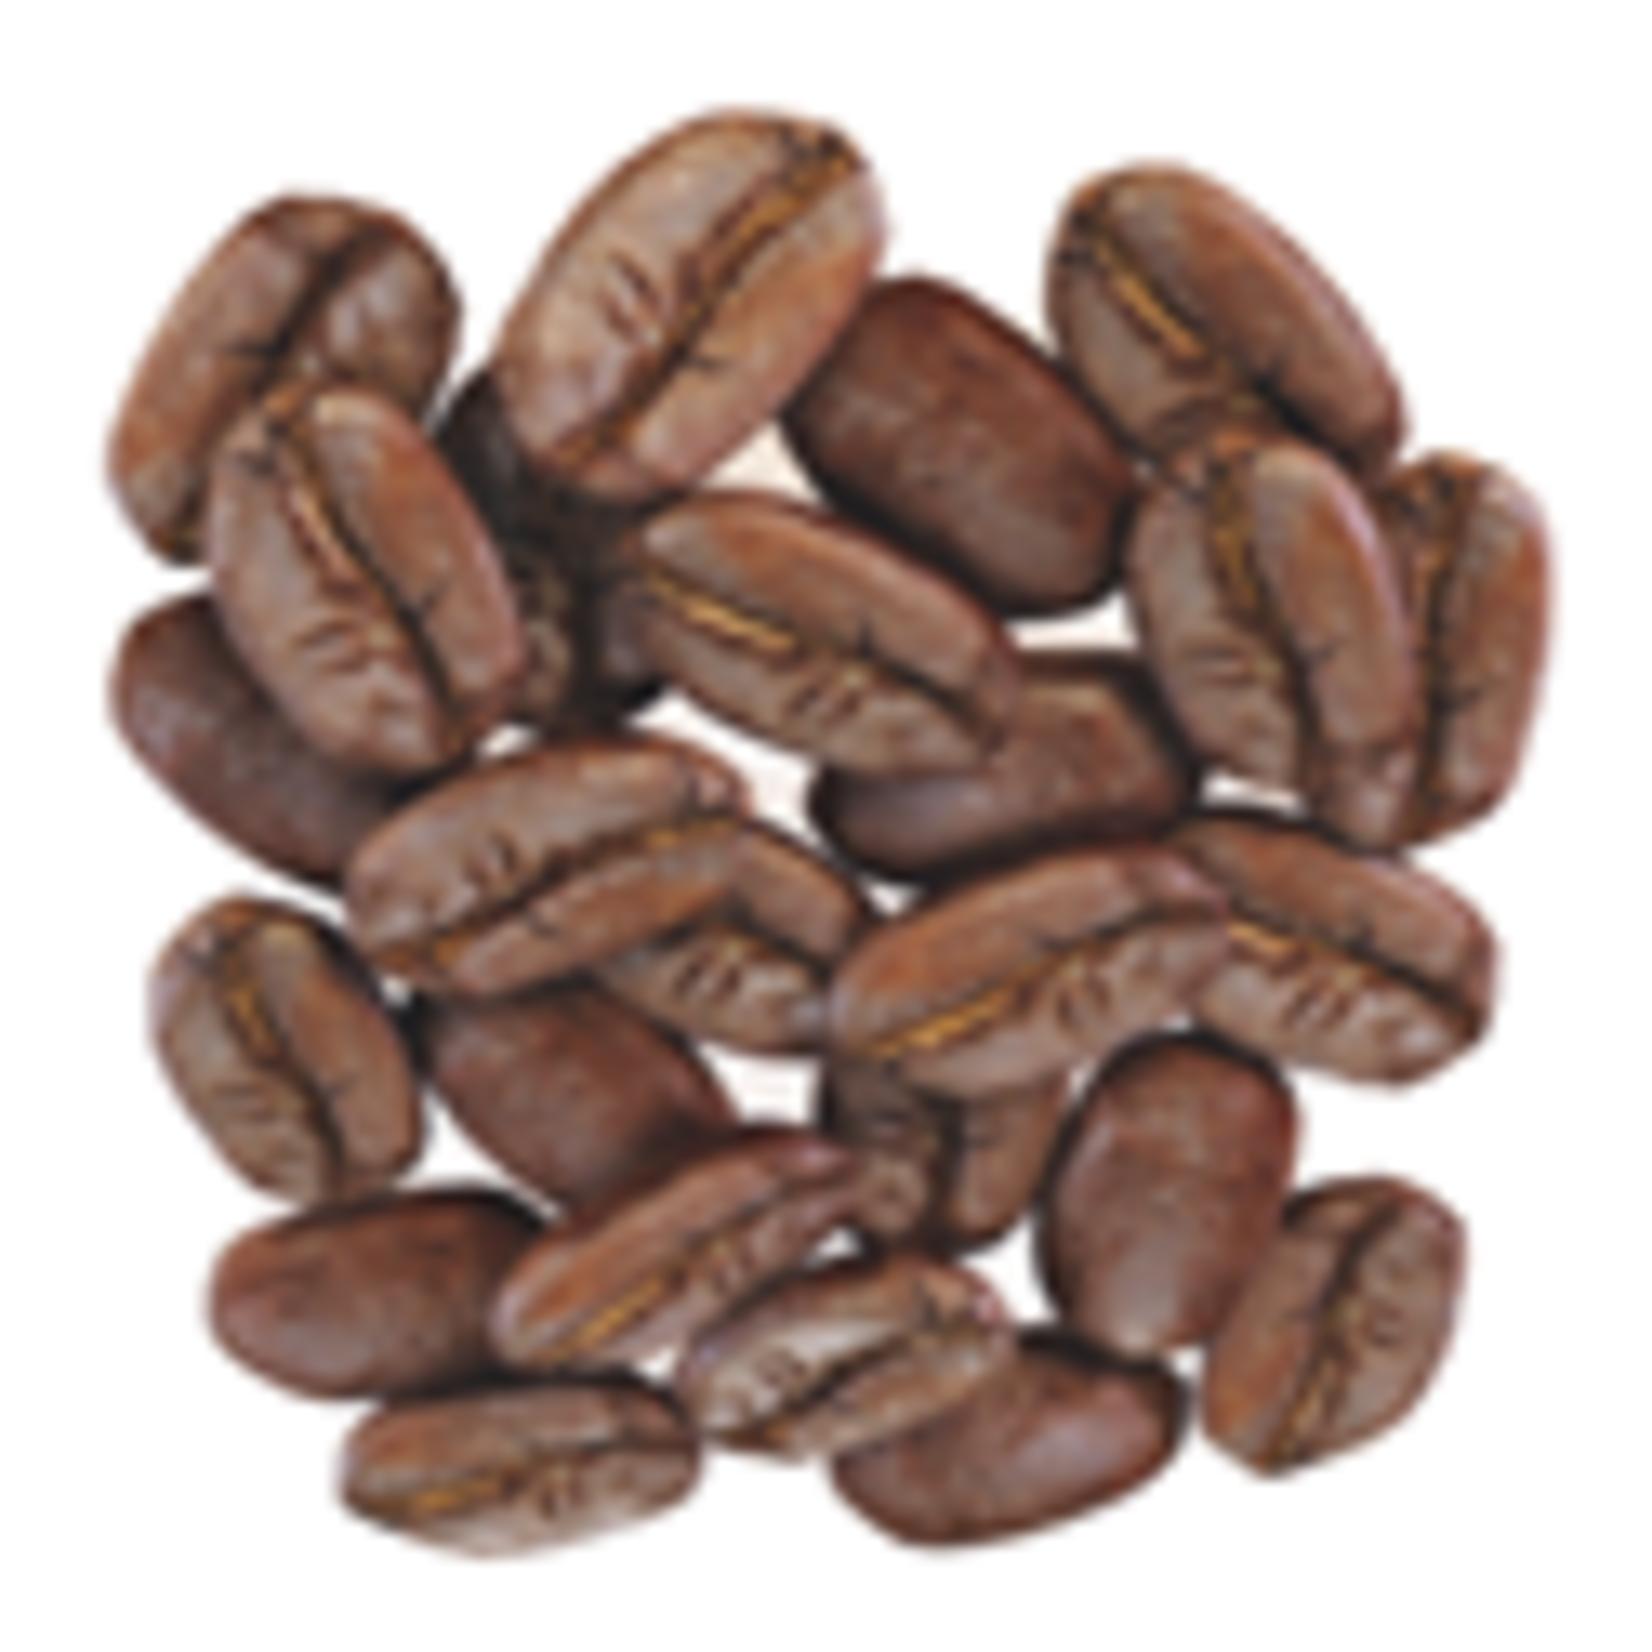 BrewBakers Coffee Bean Burundi AA 340g